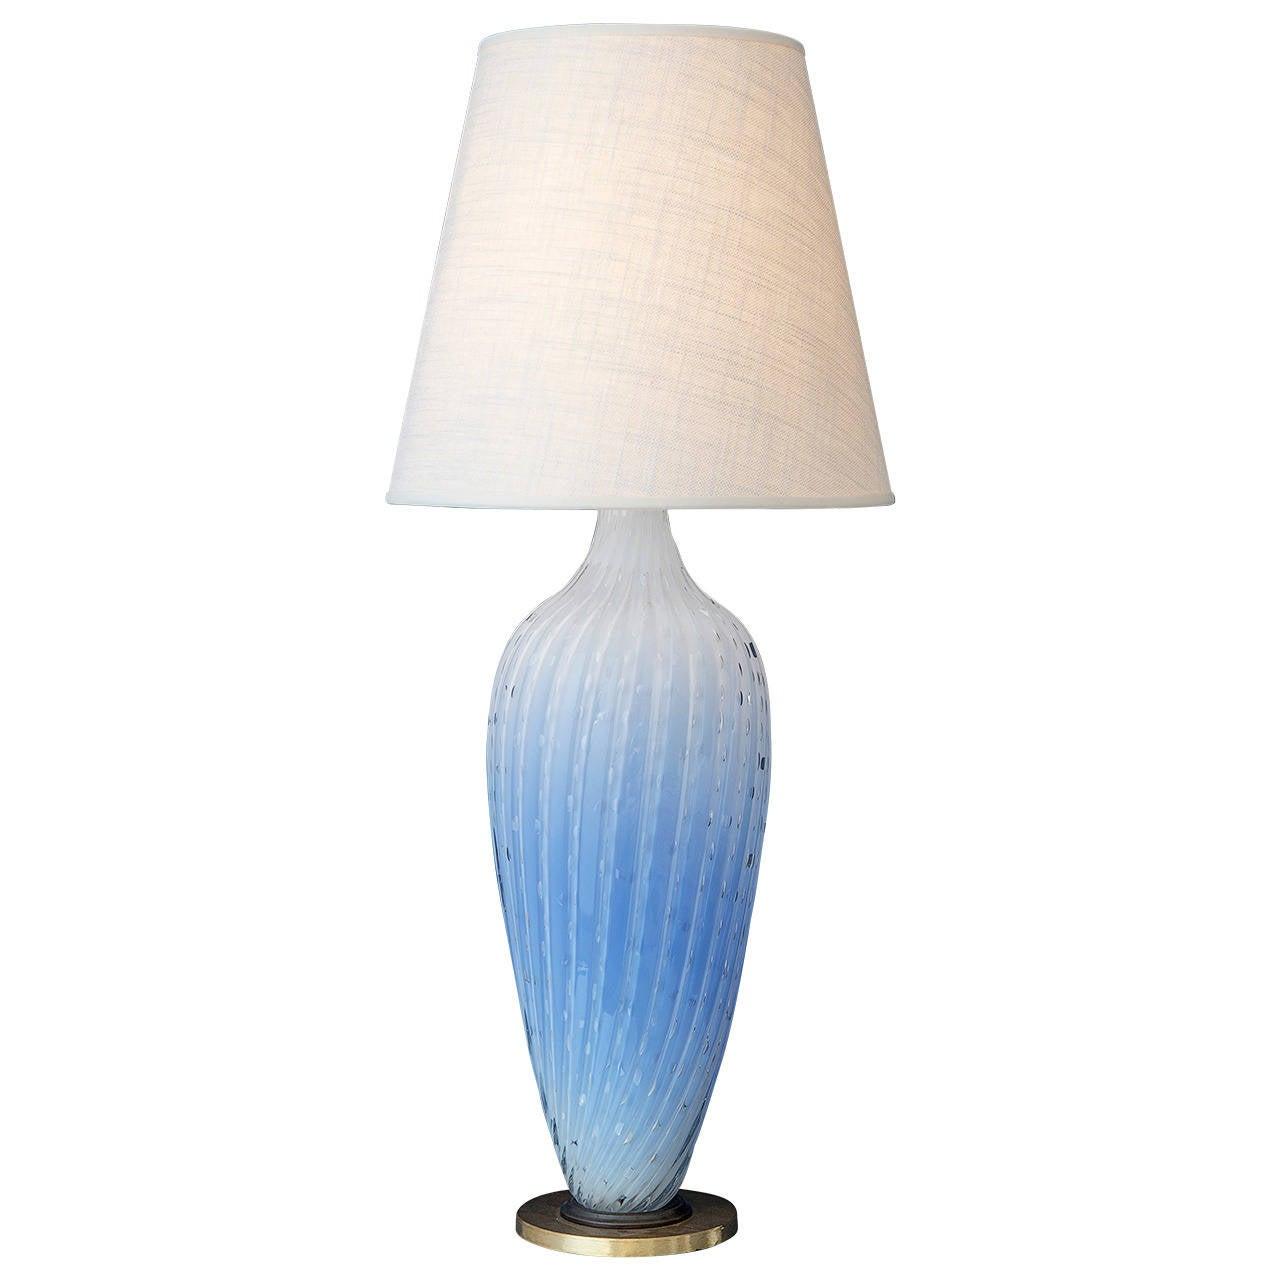 Blue glass table lamp base - Vintage Italian Murano Glass Table Lamp At 1stdibs